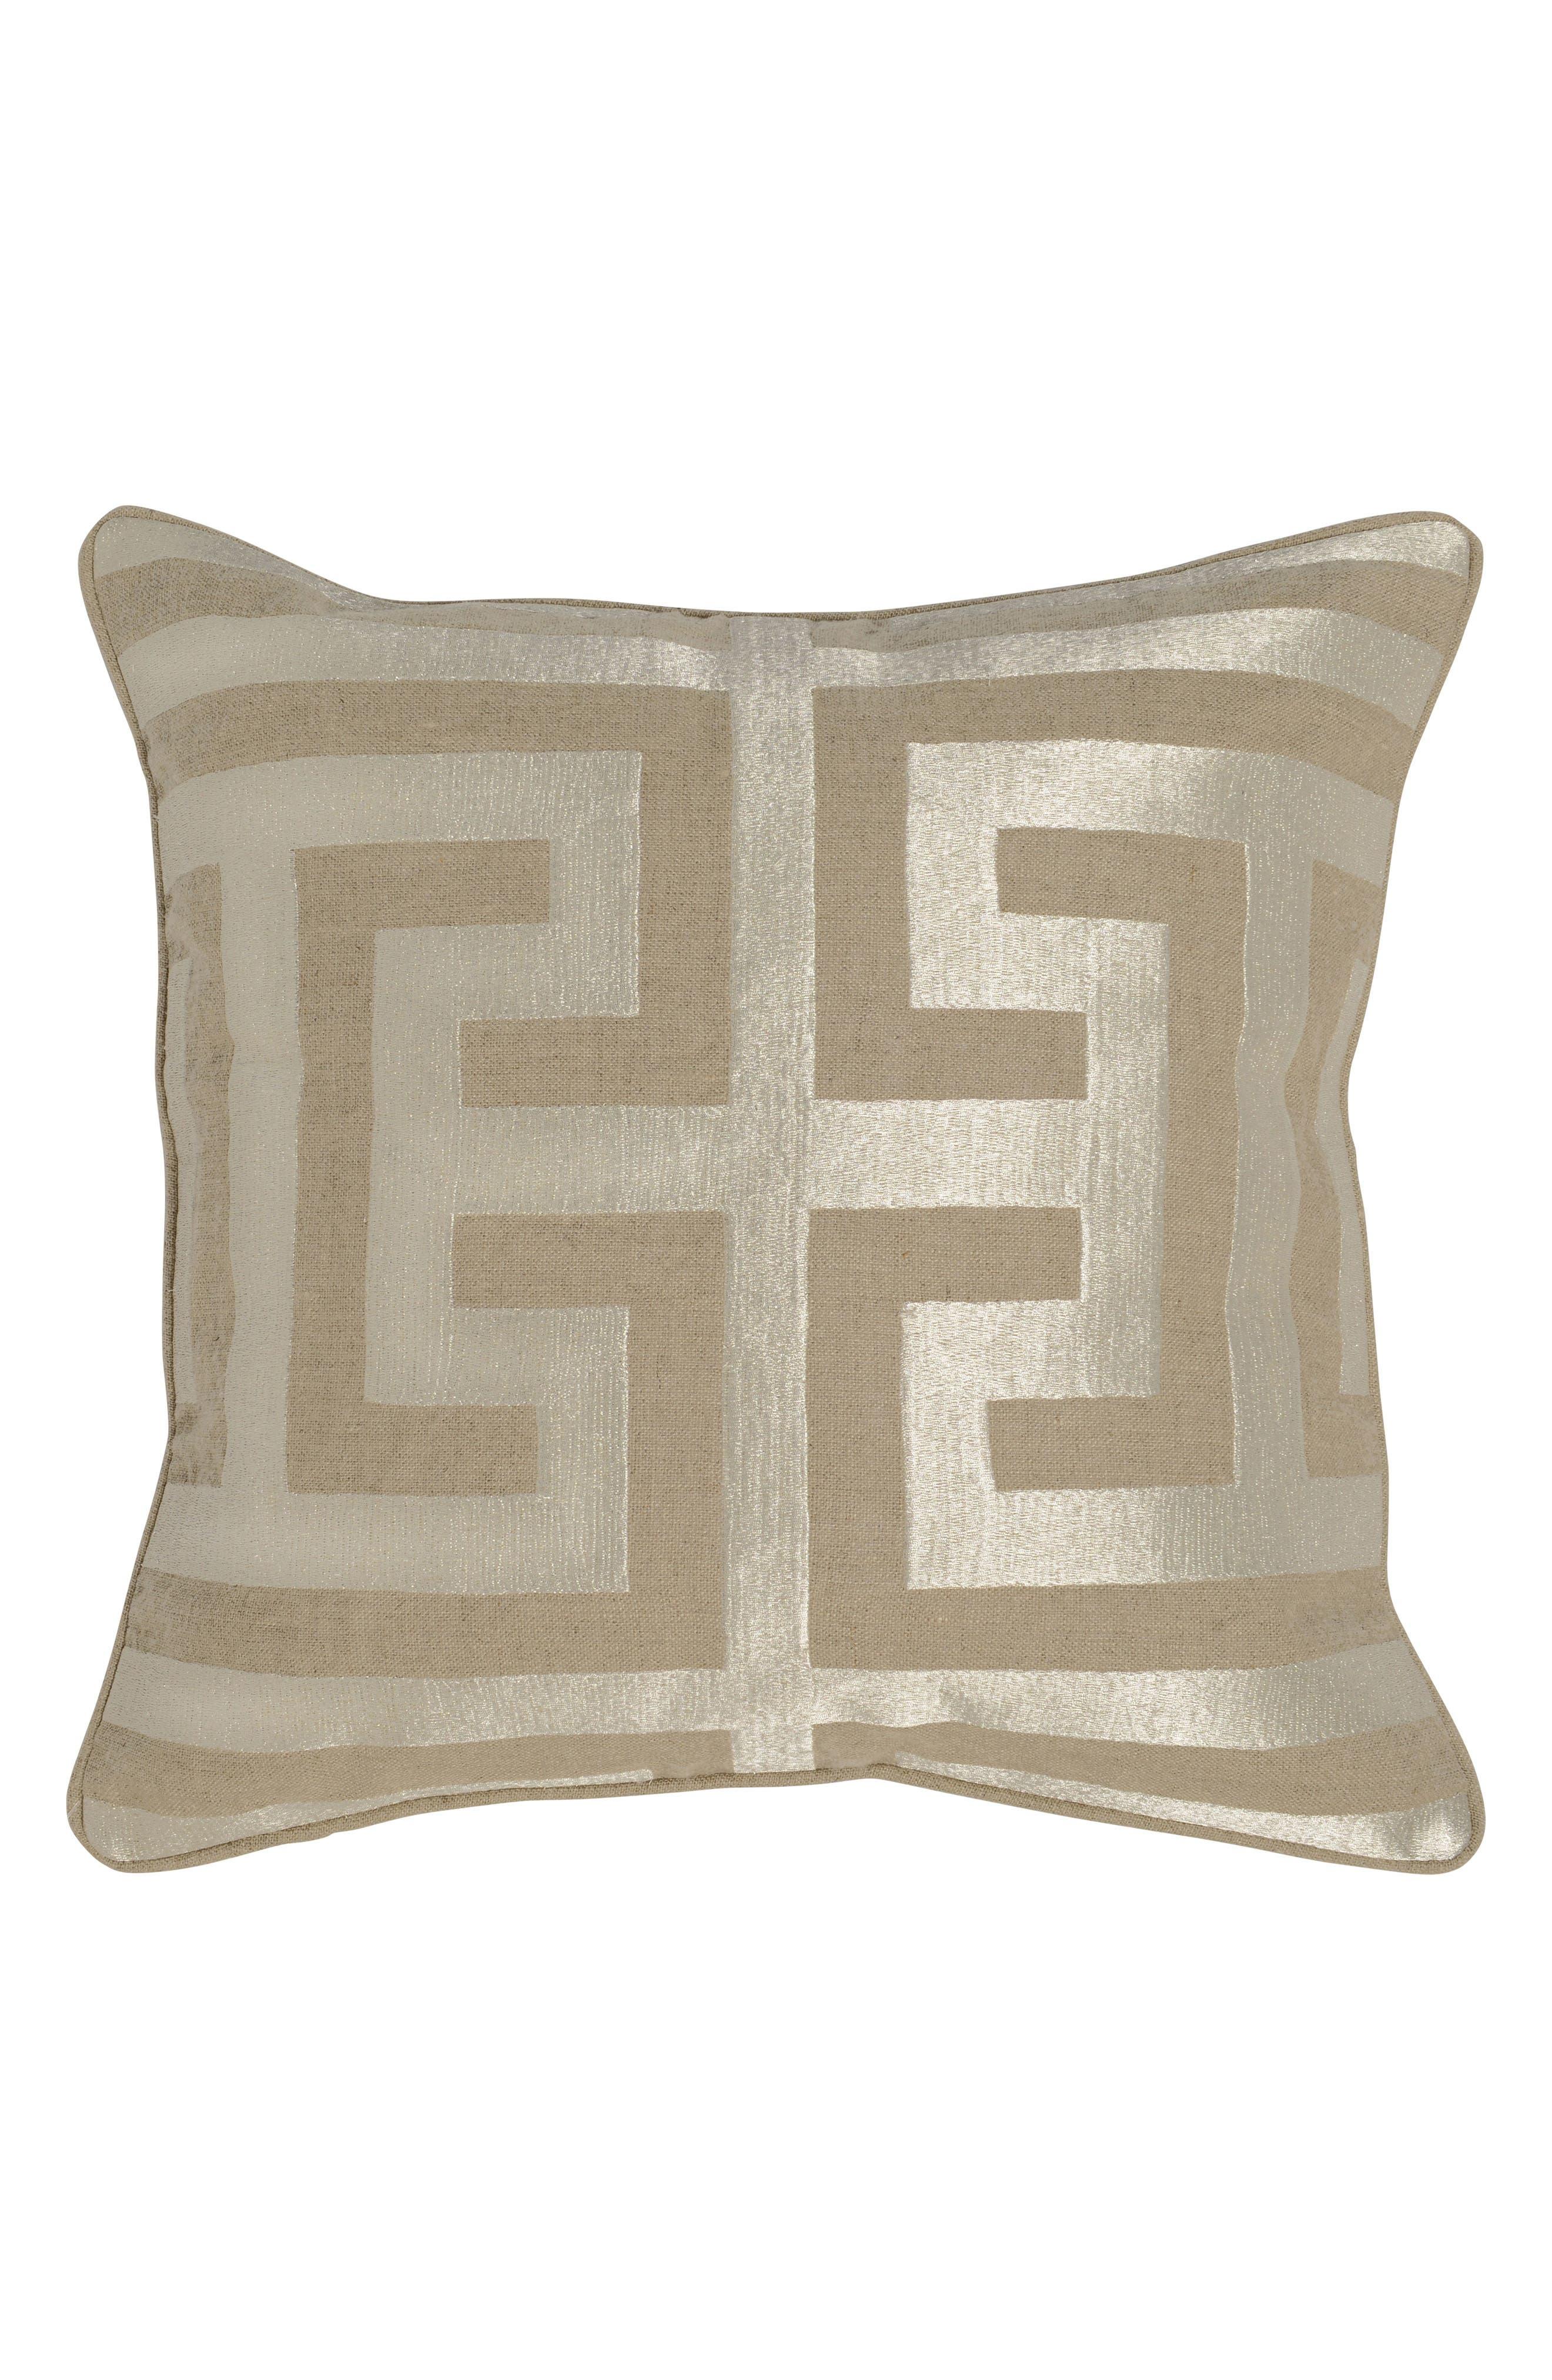 VILLA HOME COLLECTION 'Capital' Decorative Pillow, Main, color, 250